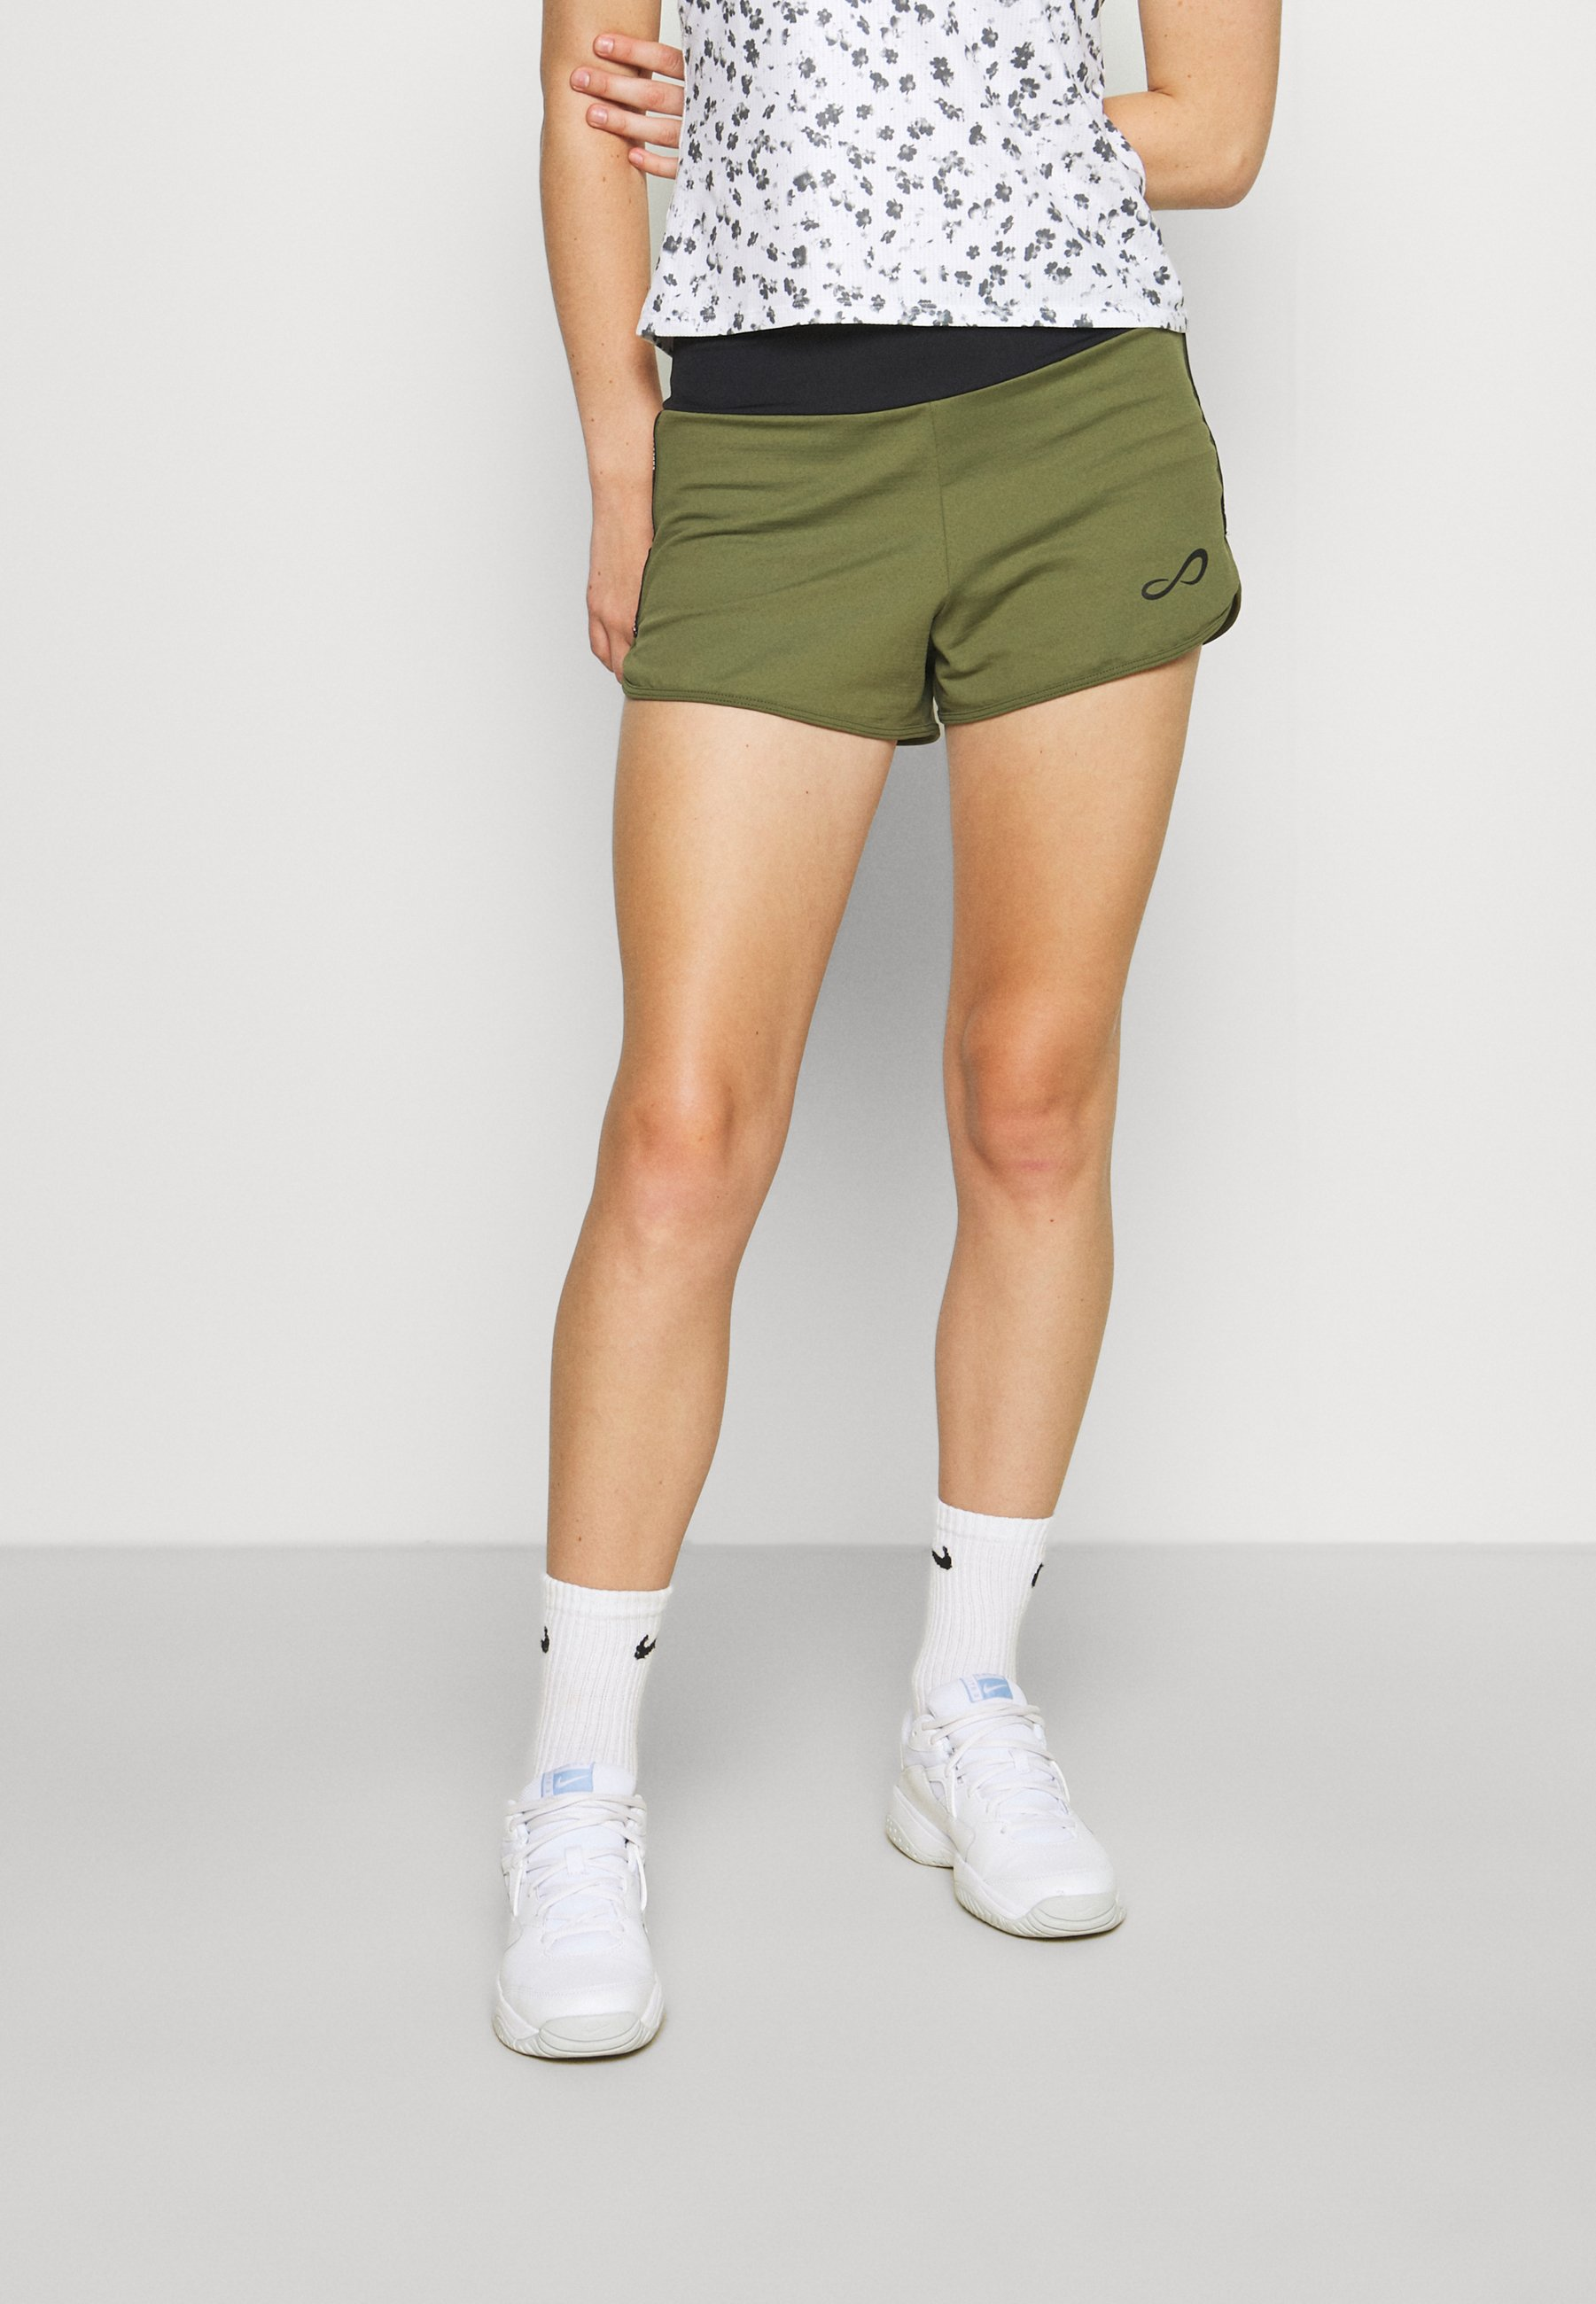 Damen SHORT TECH - kurze Sporthose